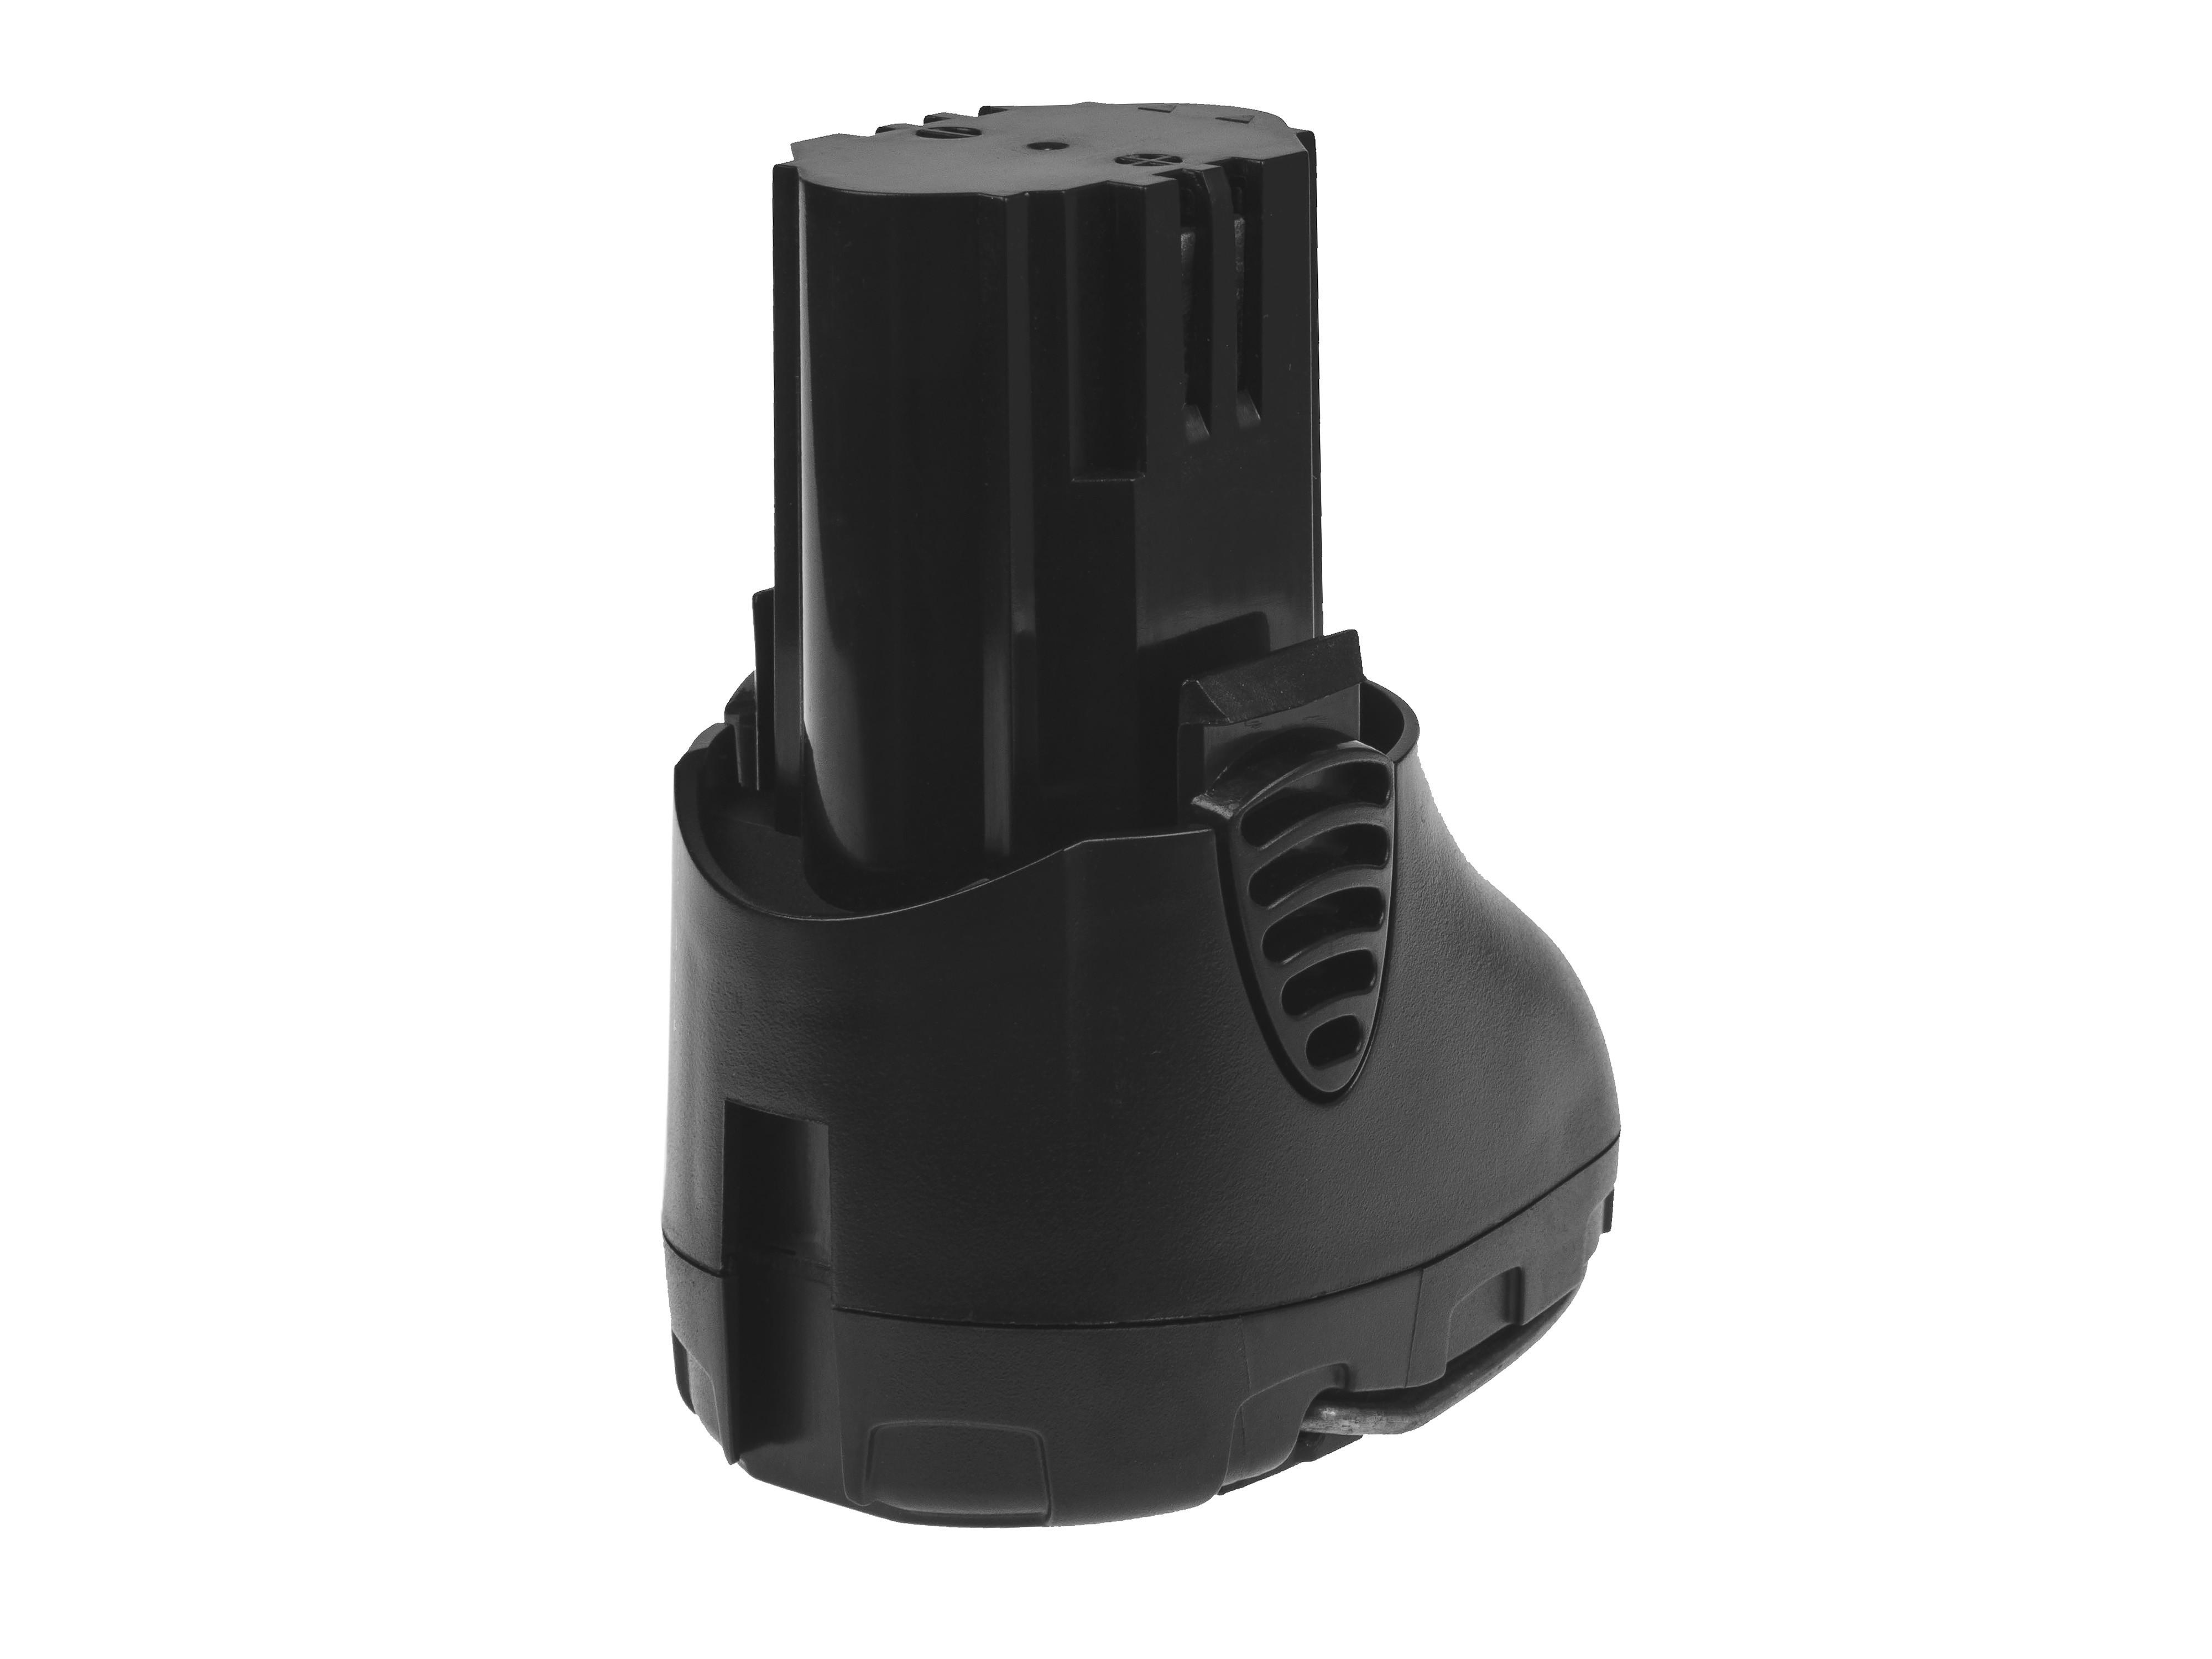 Green Cell PT220 Baterie Dremel 855-01 855-02 855-45,Dremel 8000-01 8001-01 8001-02 2000mAh Li-ion - neoriginální